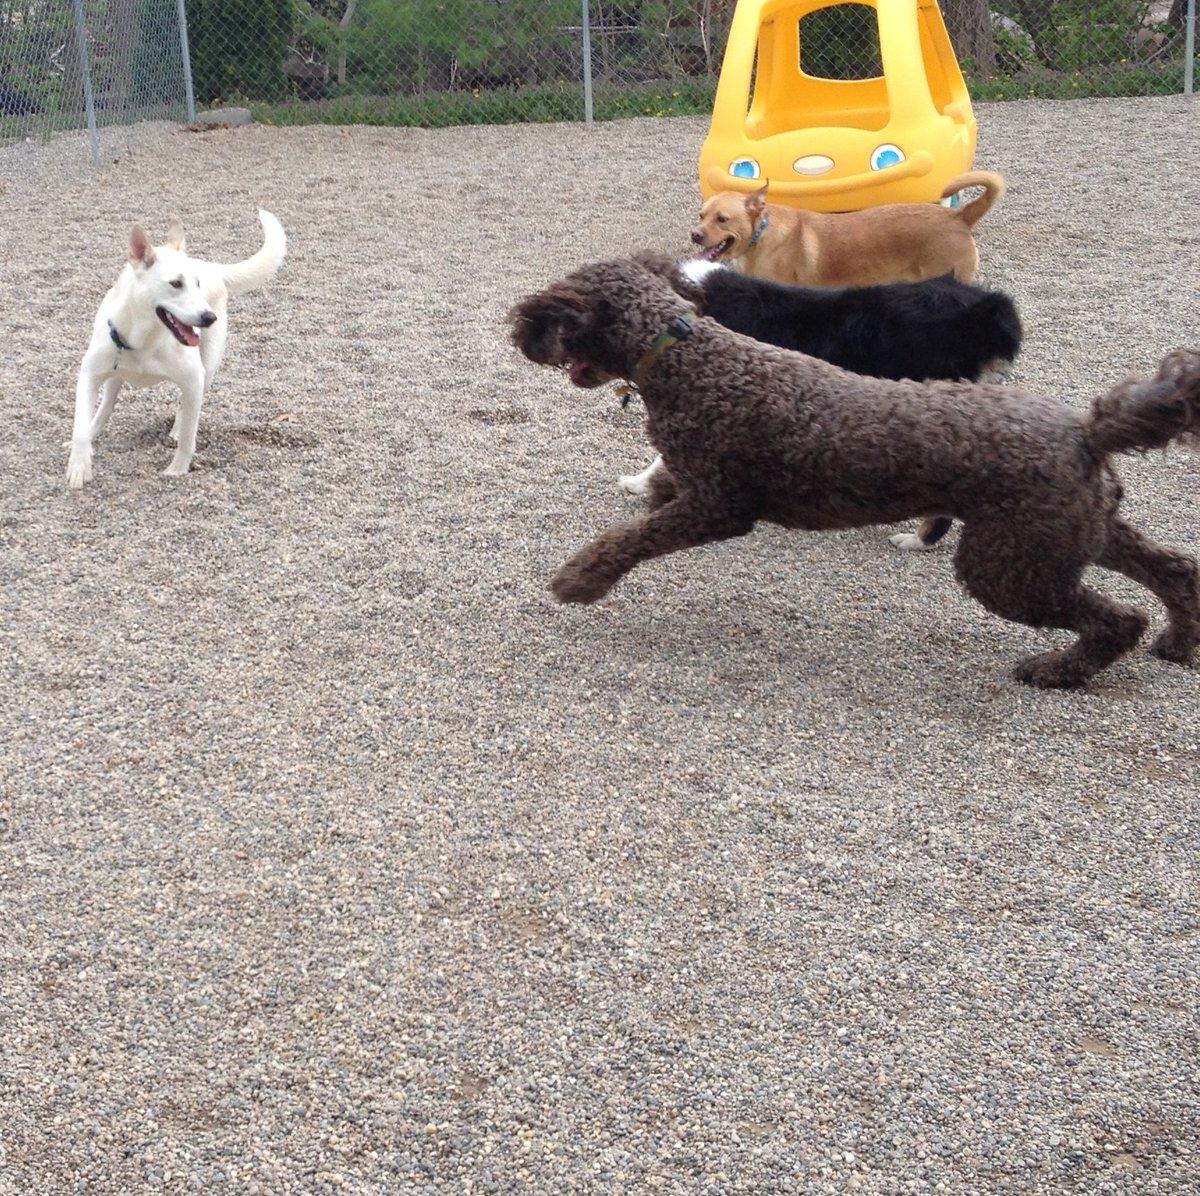 Tucker, Minnie, and Sampson leap towards Leif!